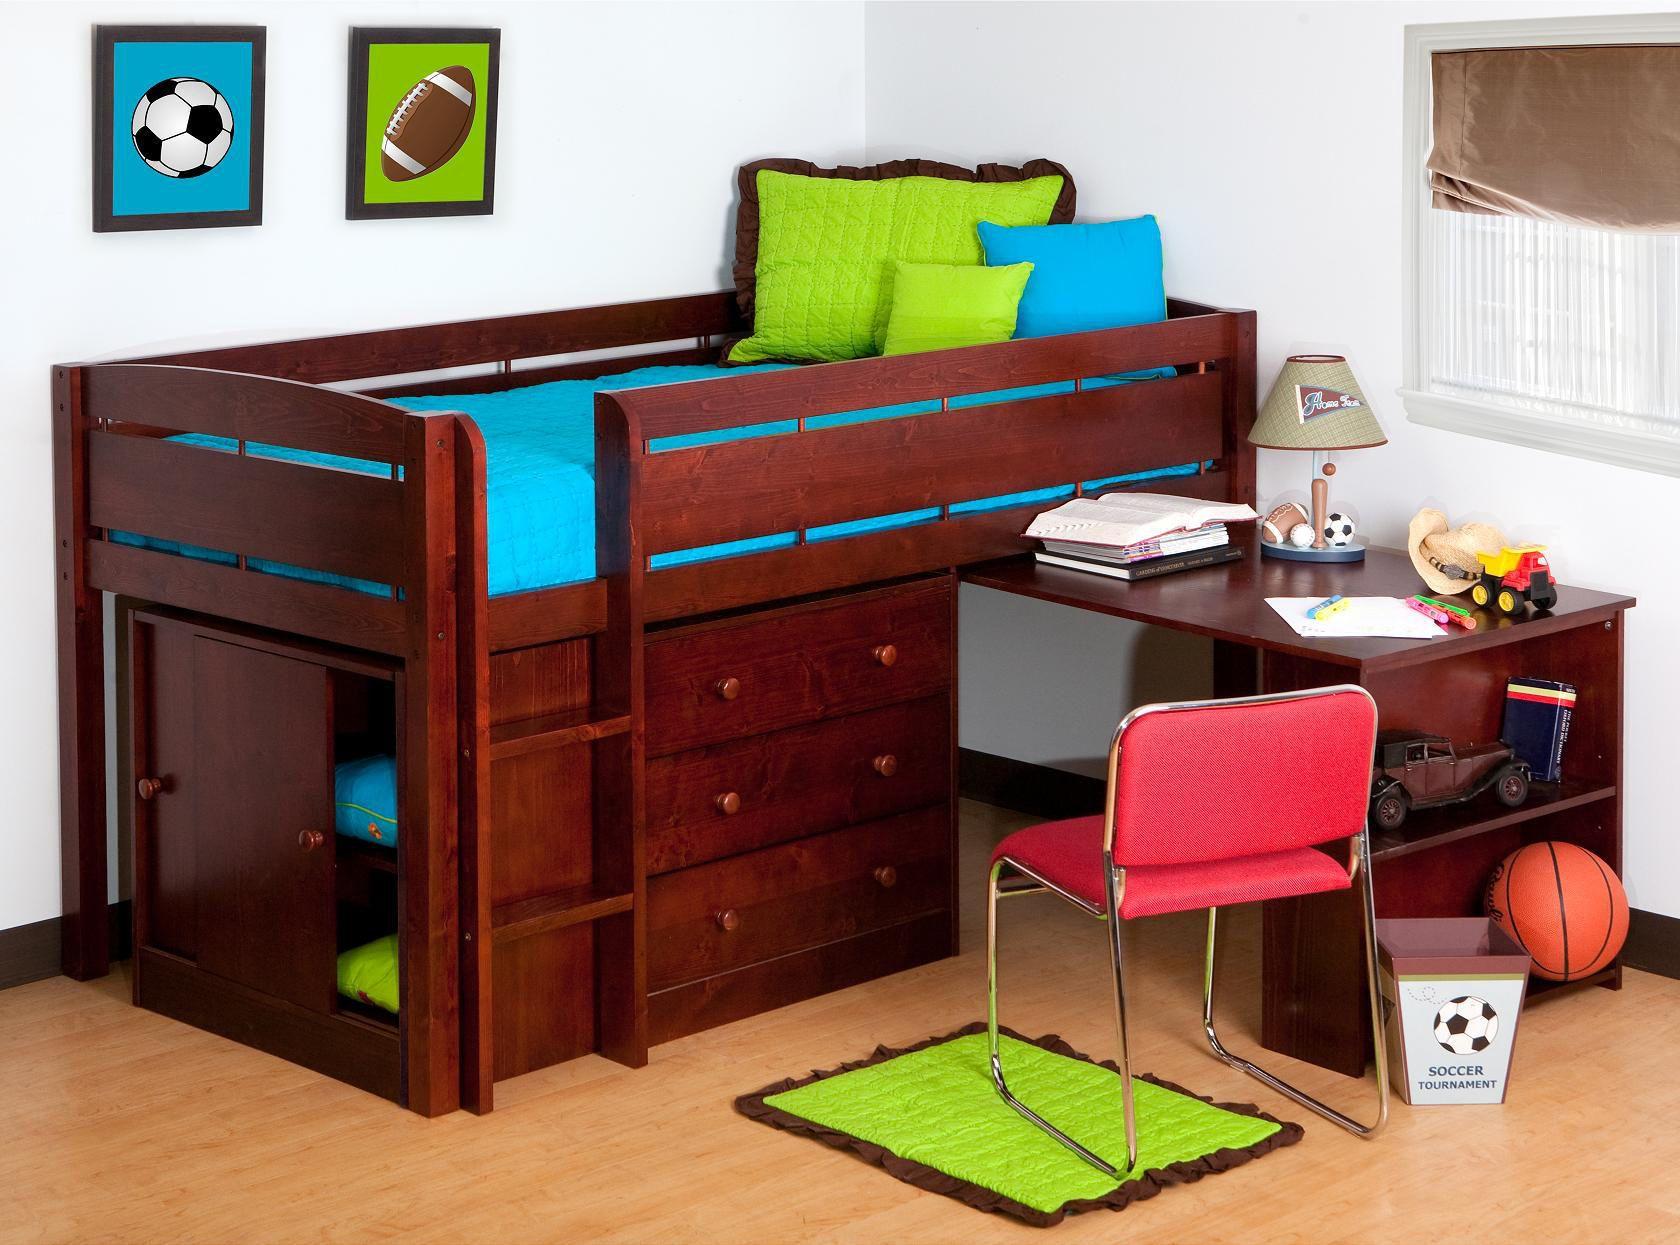 Canwood Whistler Junior Loft Bed Walmart Canada